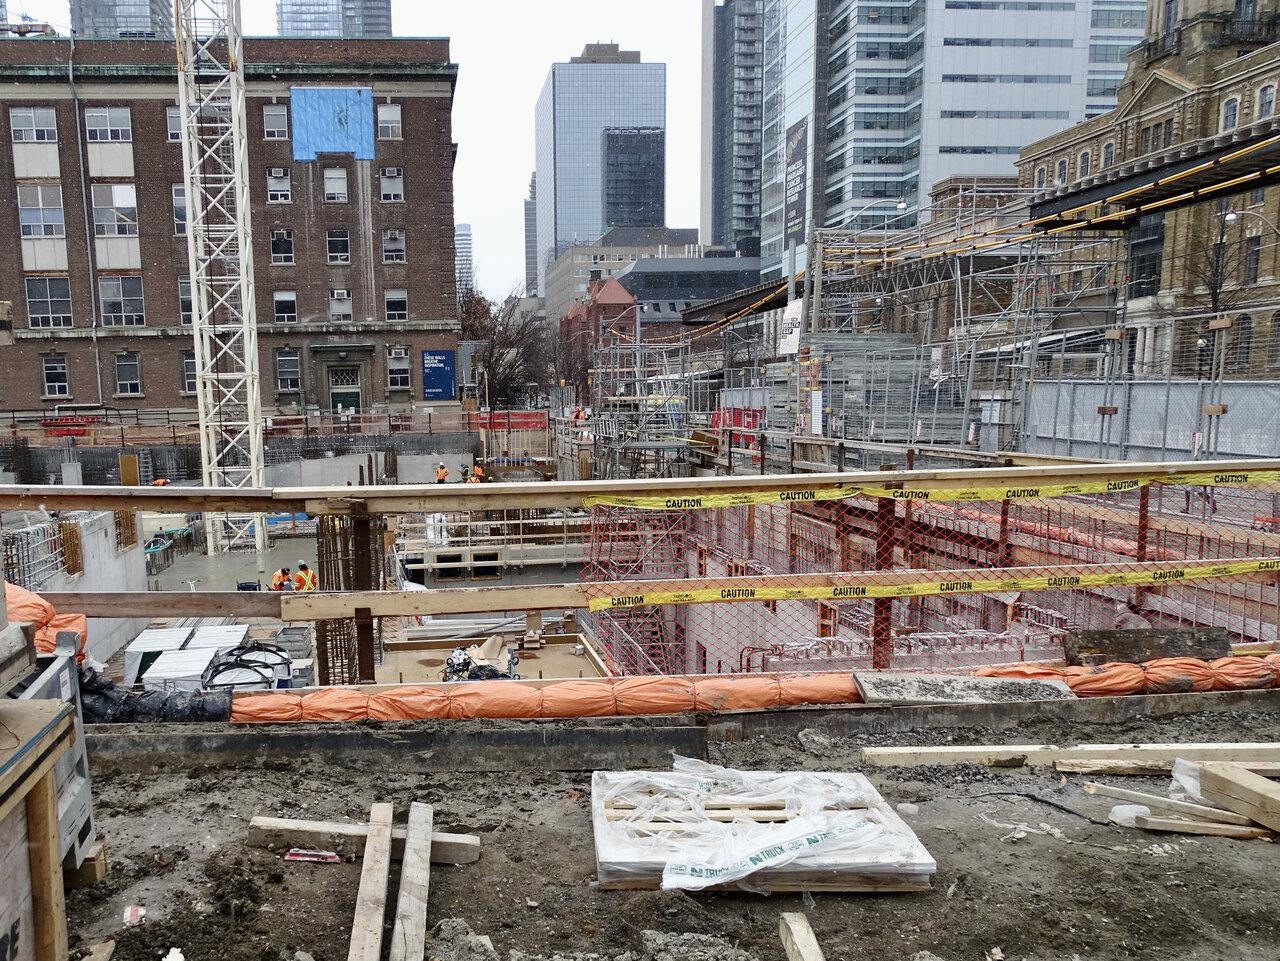 Schwartz Reisman Innovation Centre, University of Toronto, Weiss/Manfredi Architects, Teeple